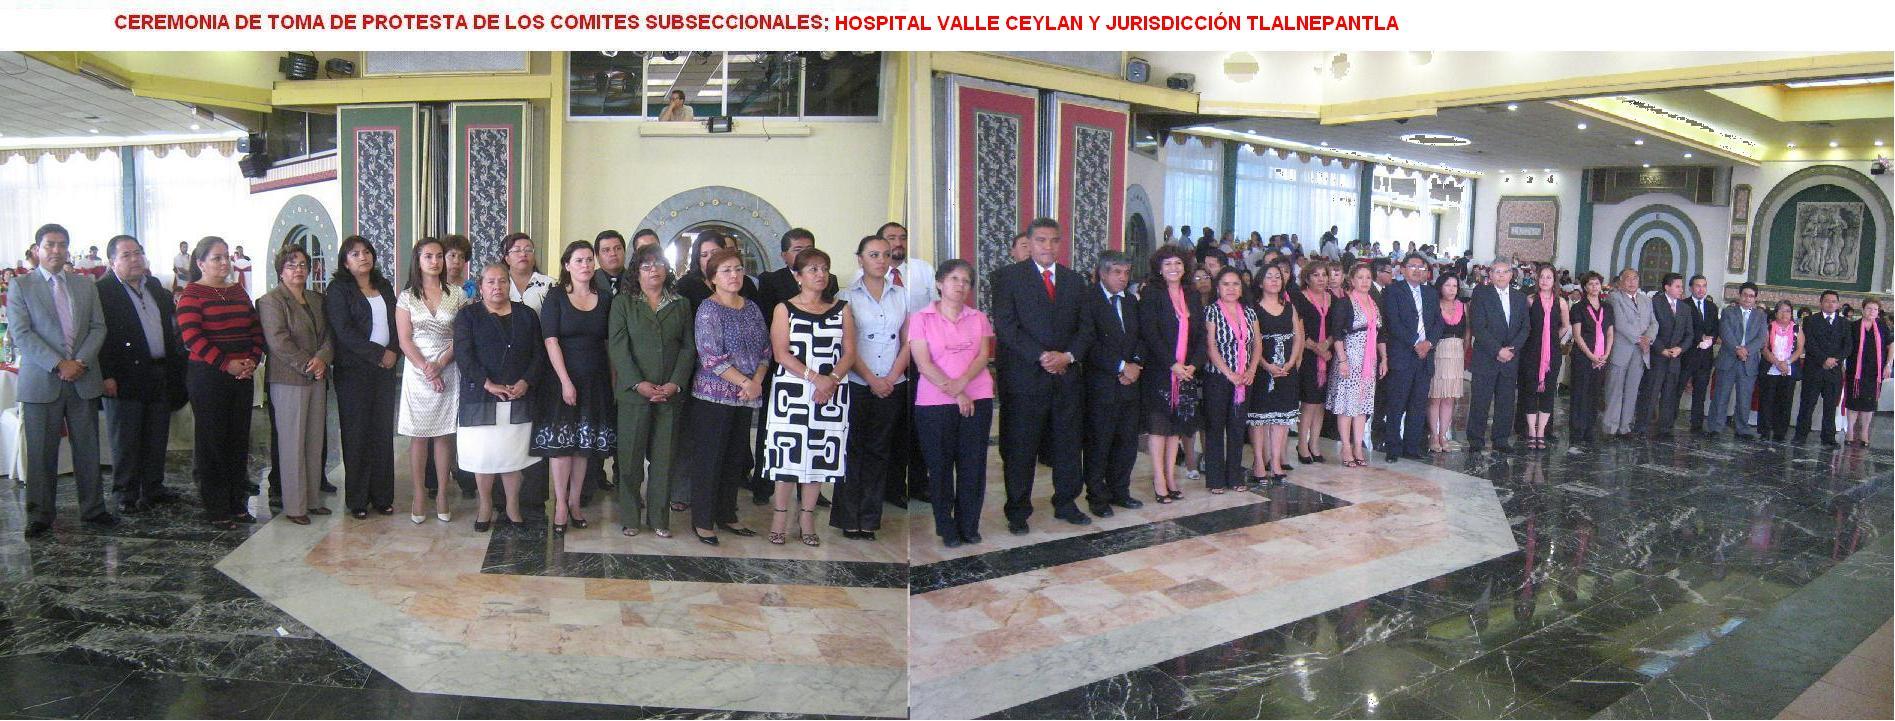 hospital-valle de ceylan